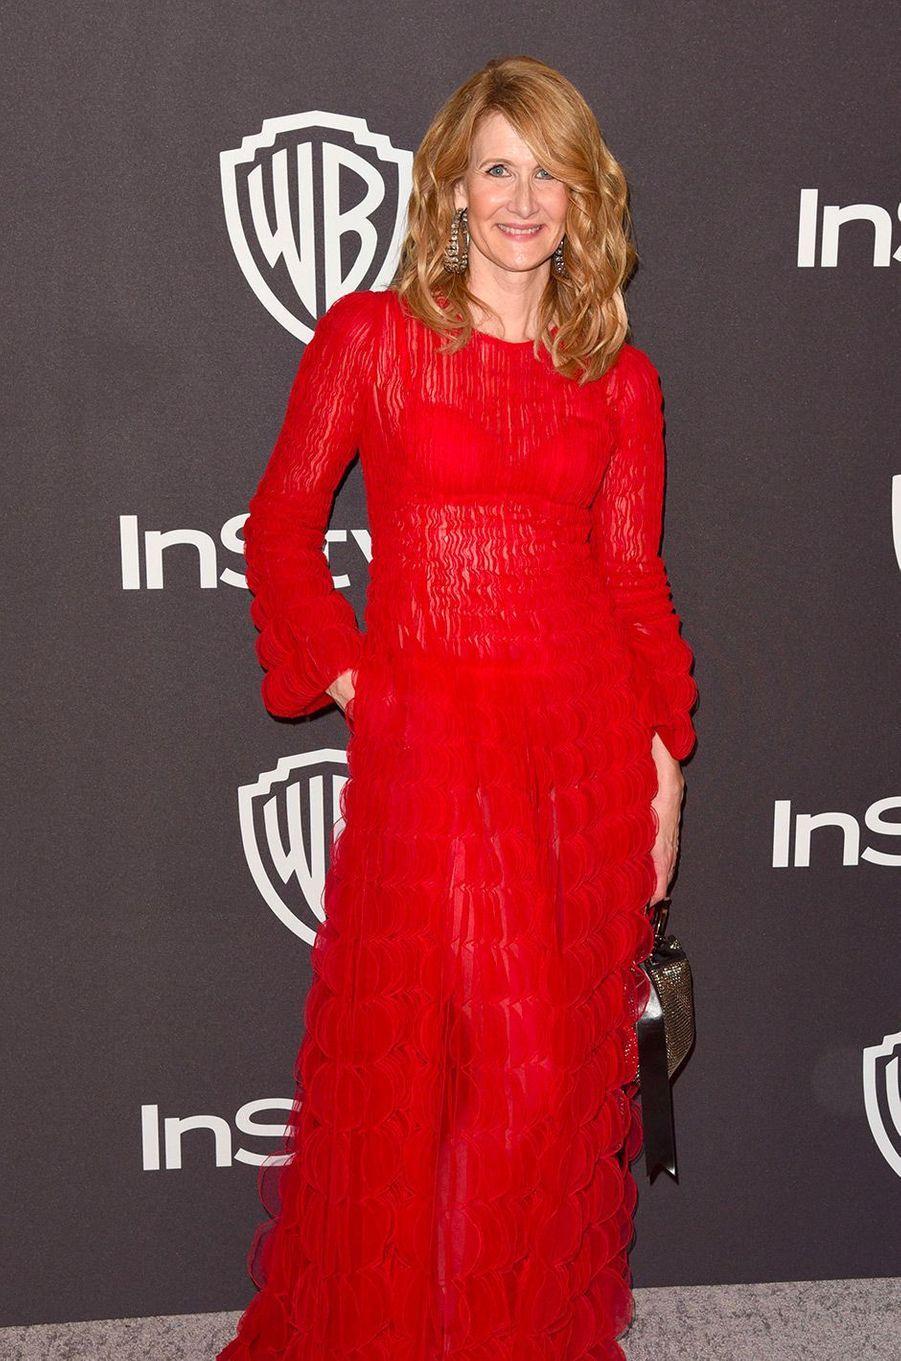 Laura Dern à l'after-party In Style & Warner Bros, dimanche 6 janvier